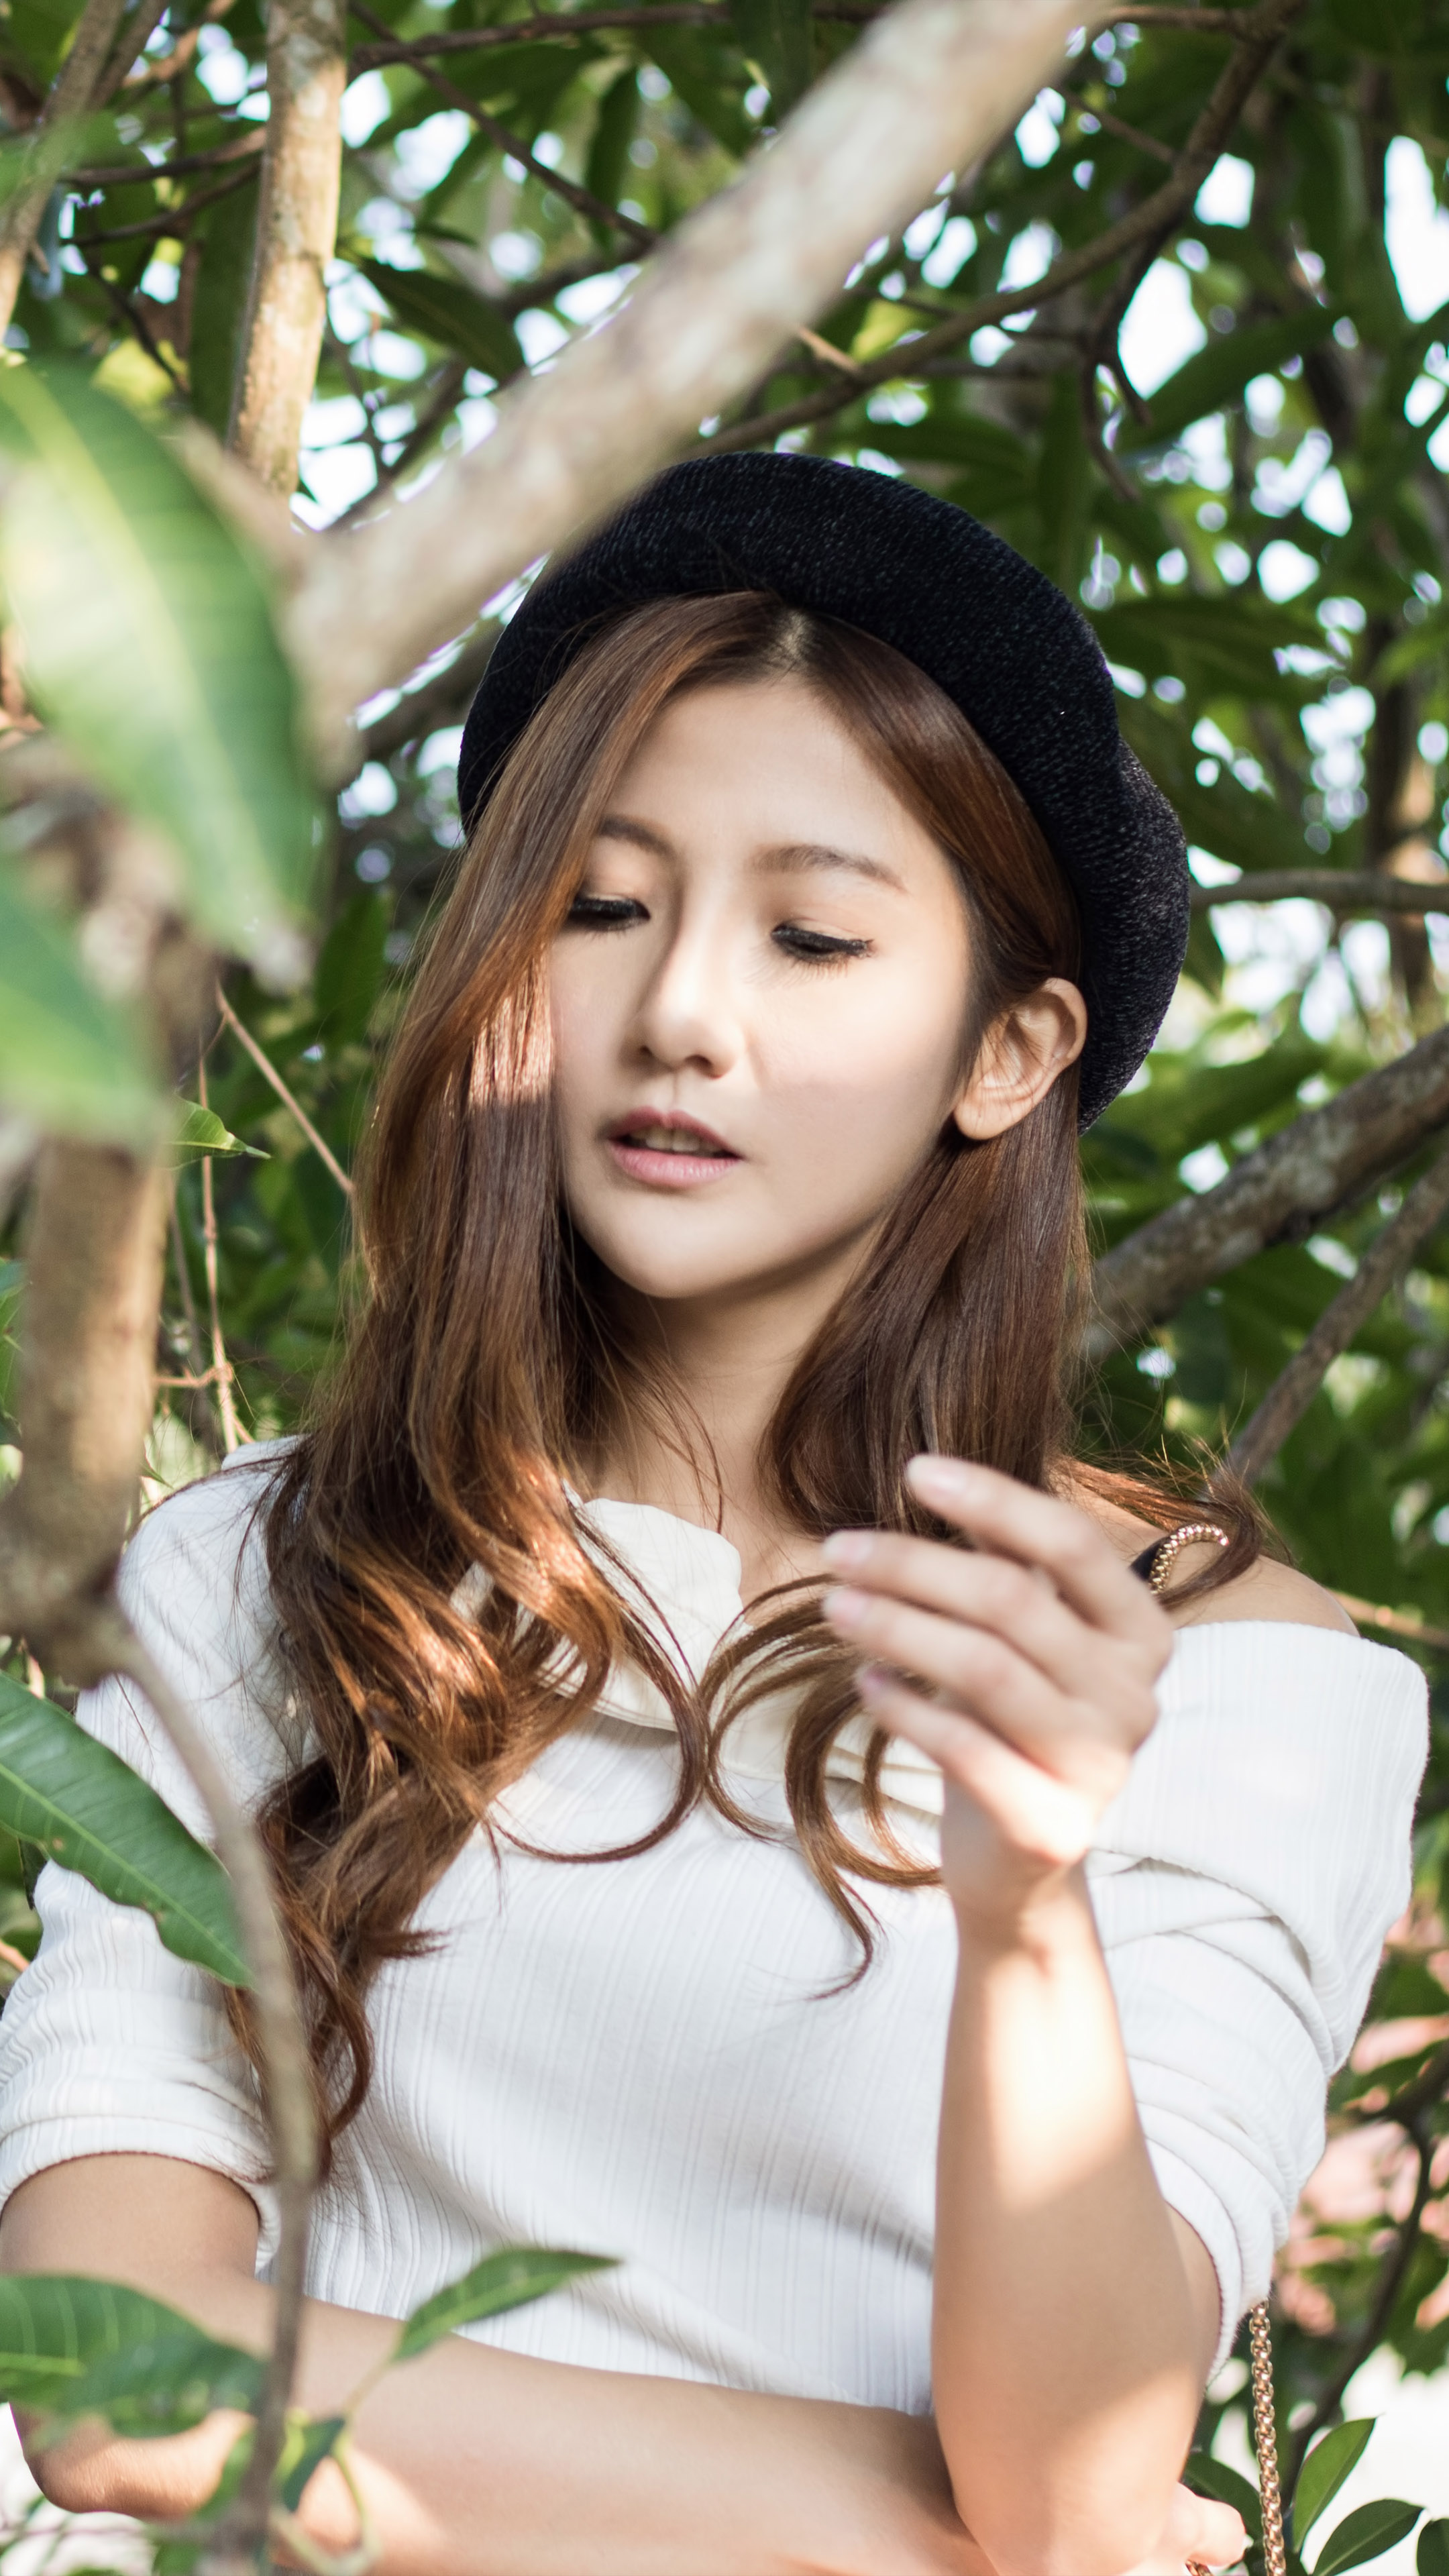 Download asian girl black hat tree free pure 4k ultra hd - Asian girl 4k ...